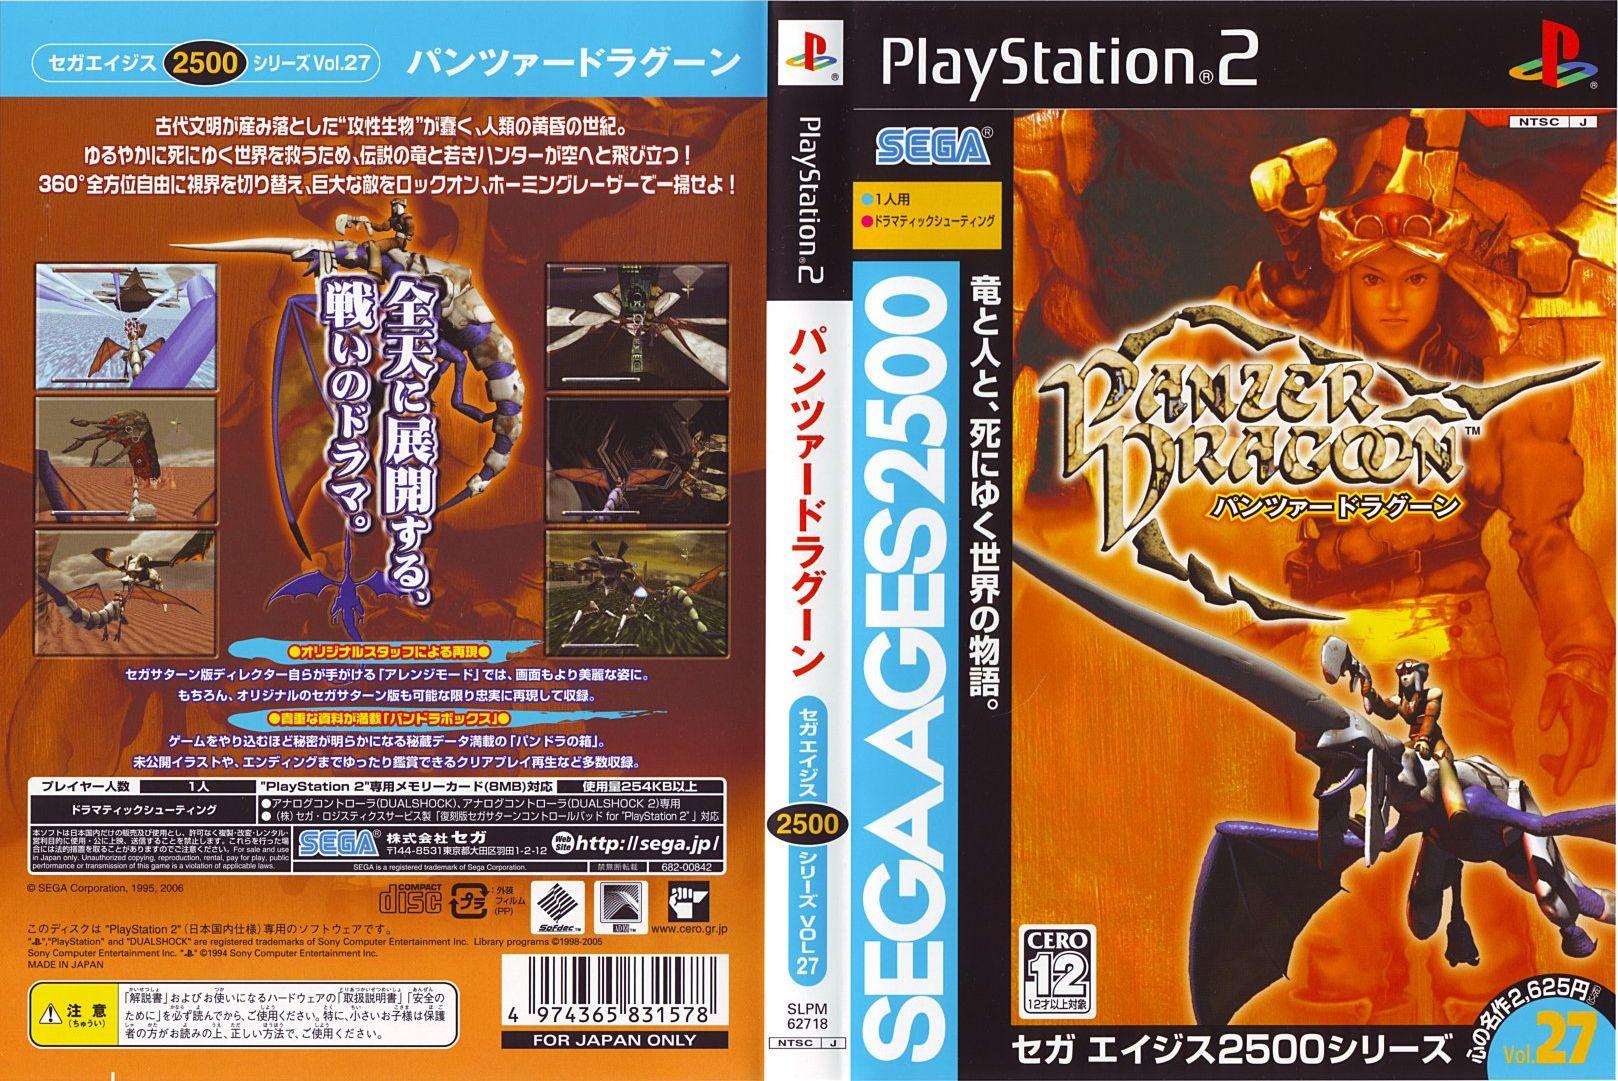 [Análise Retro Game] - Panzer Dragoon - Sega Saturn/PC/PS2 SLPM-62718-F-ALL